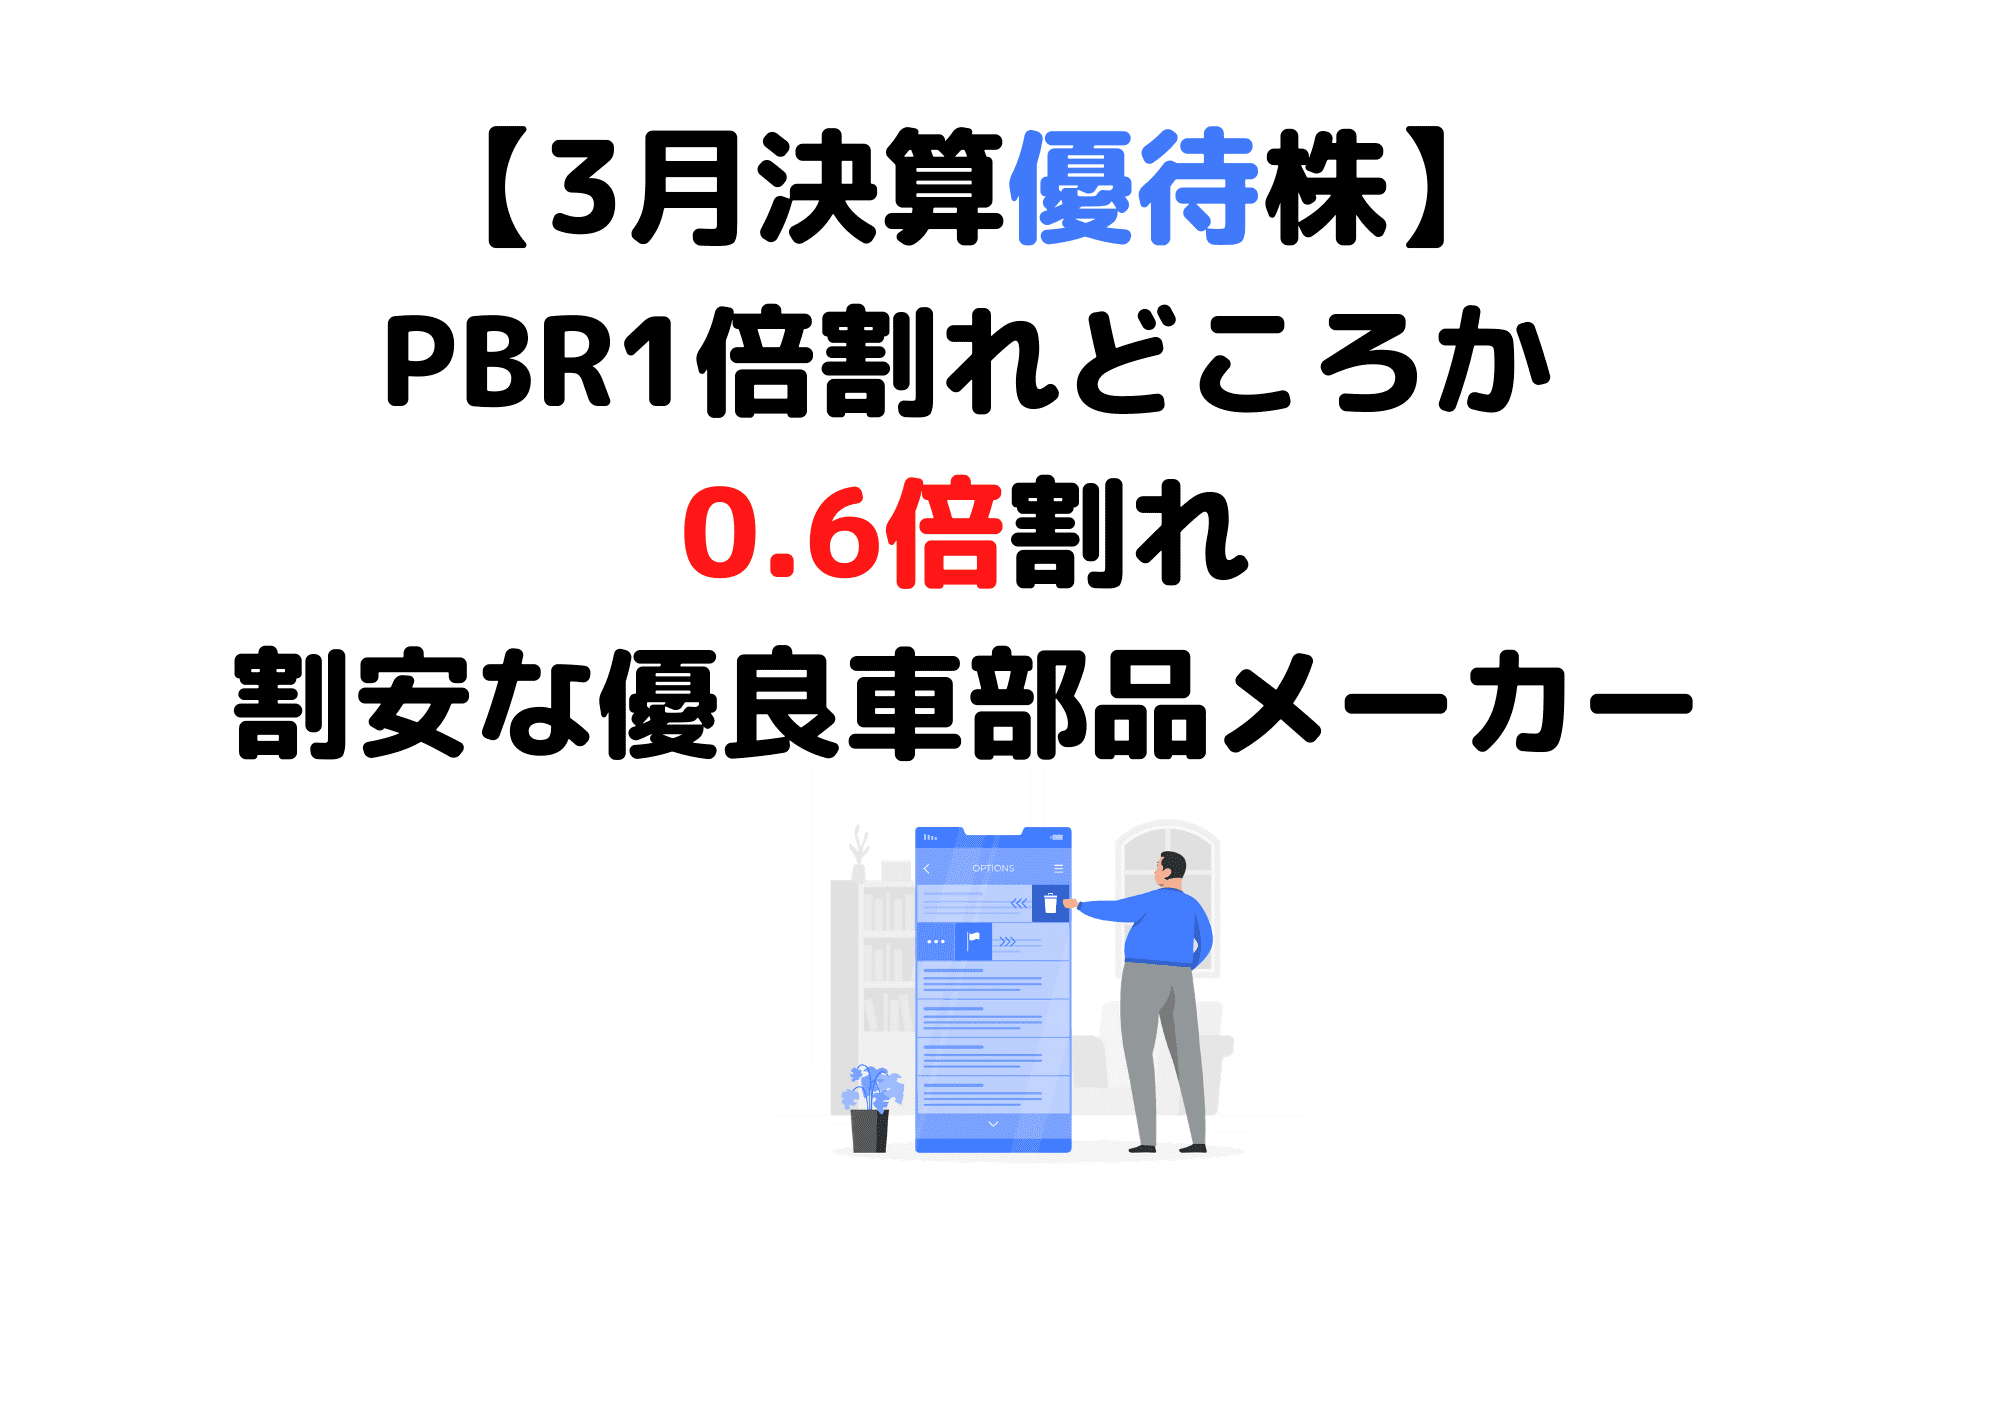 PBR (1)